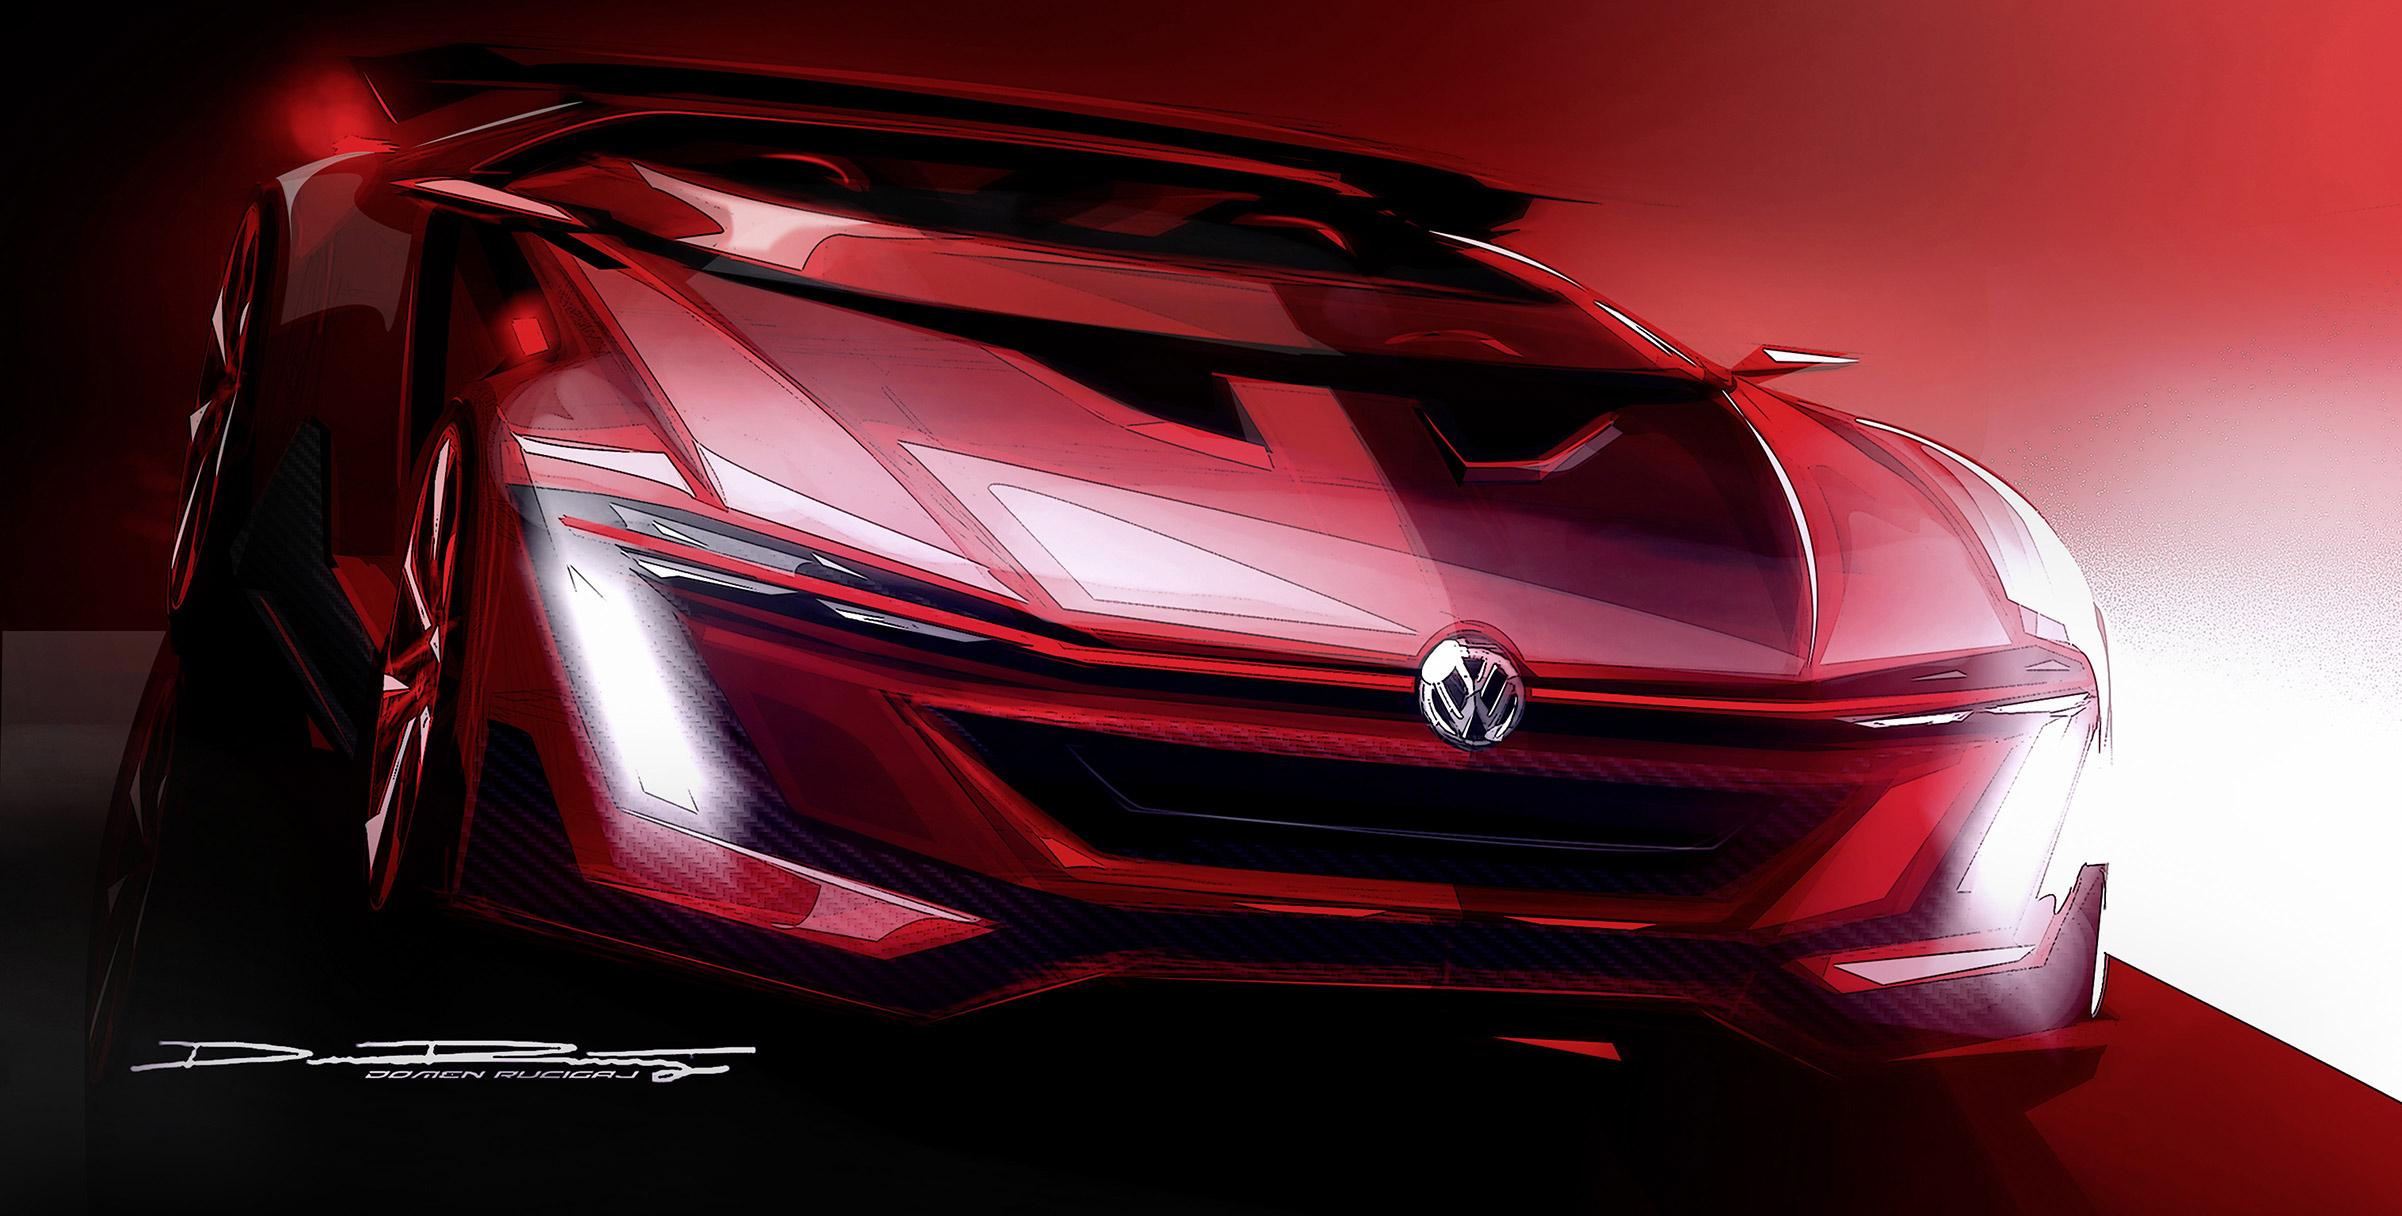 volkswagen-design-vision-gti-gran-turismo-003